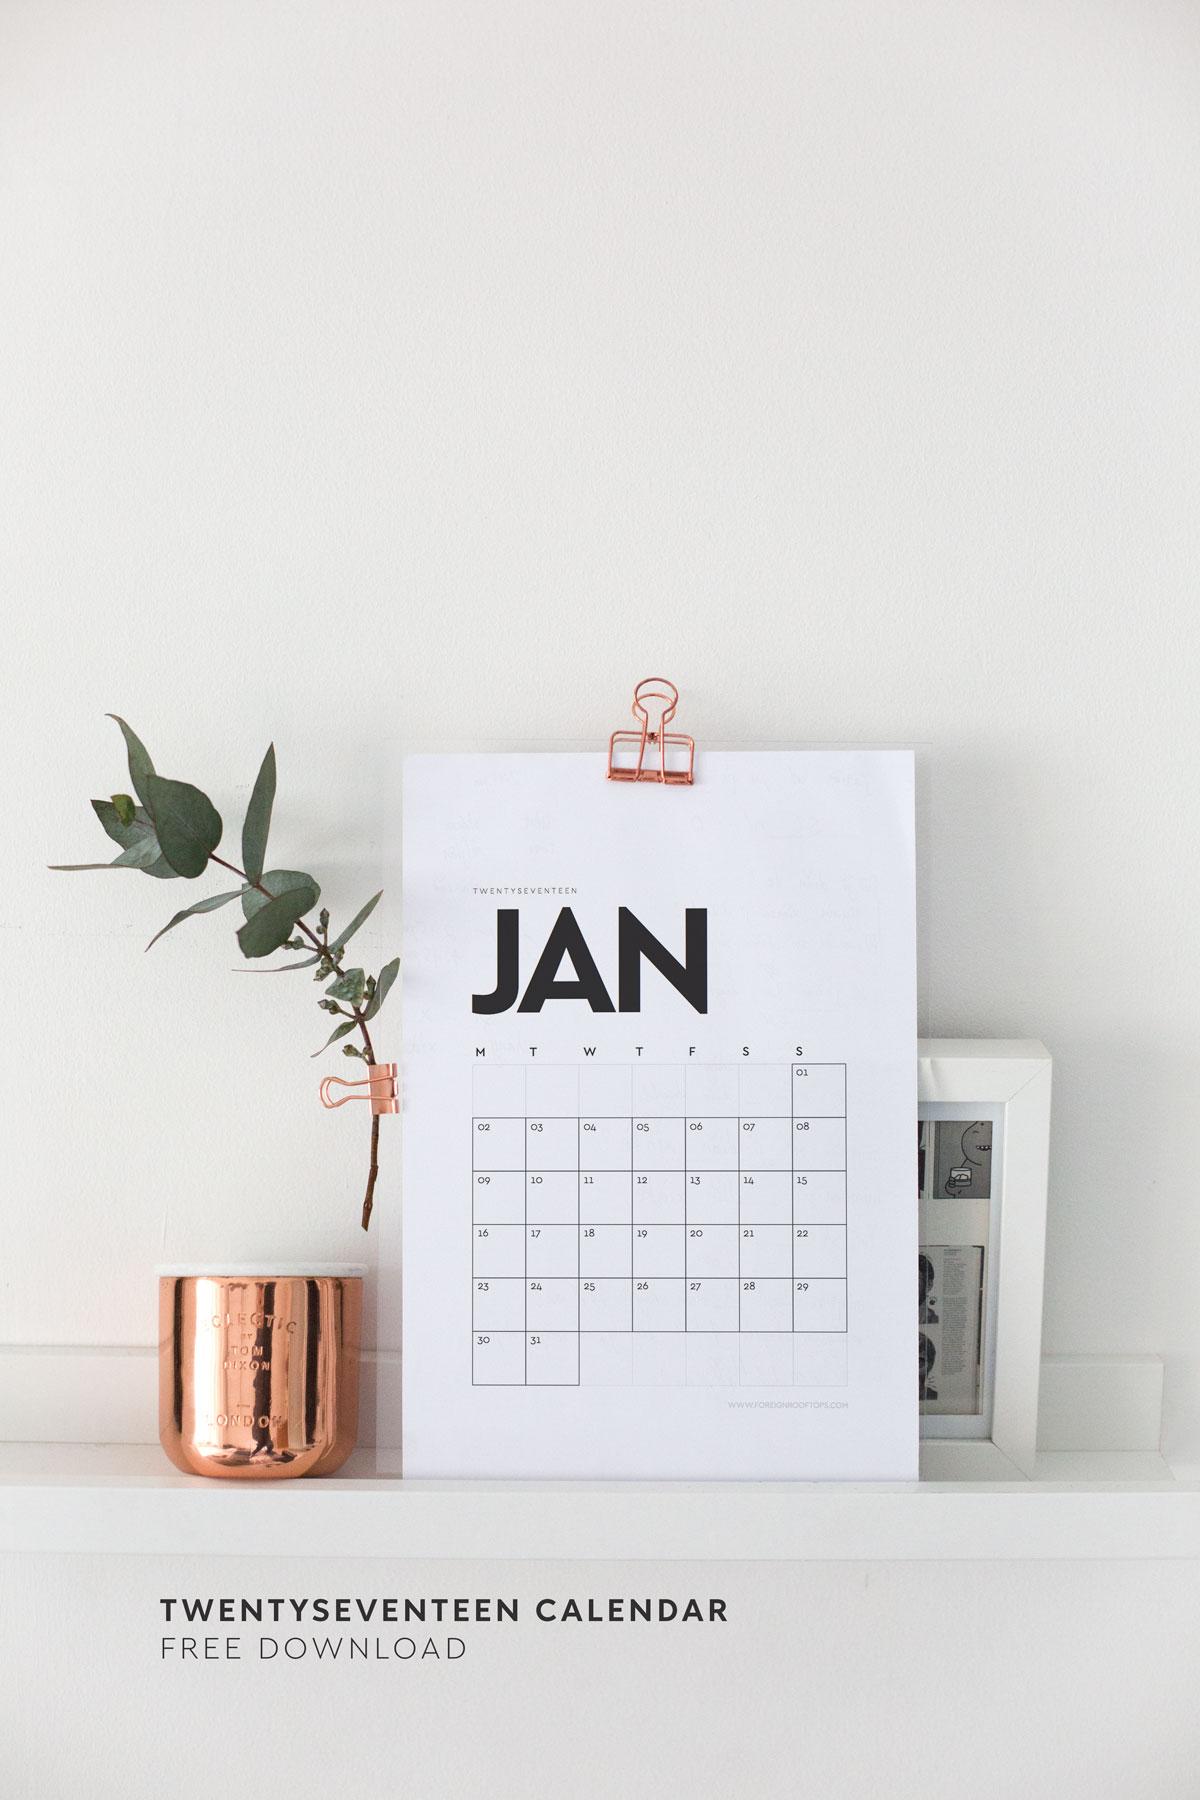 Printable Wall Calendar 2017 Free Download